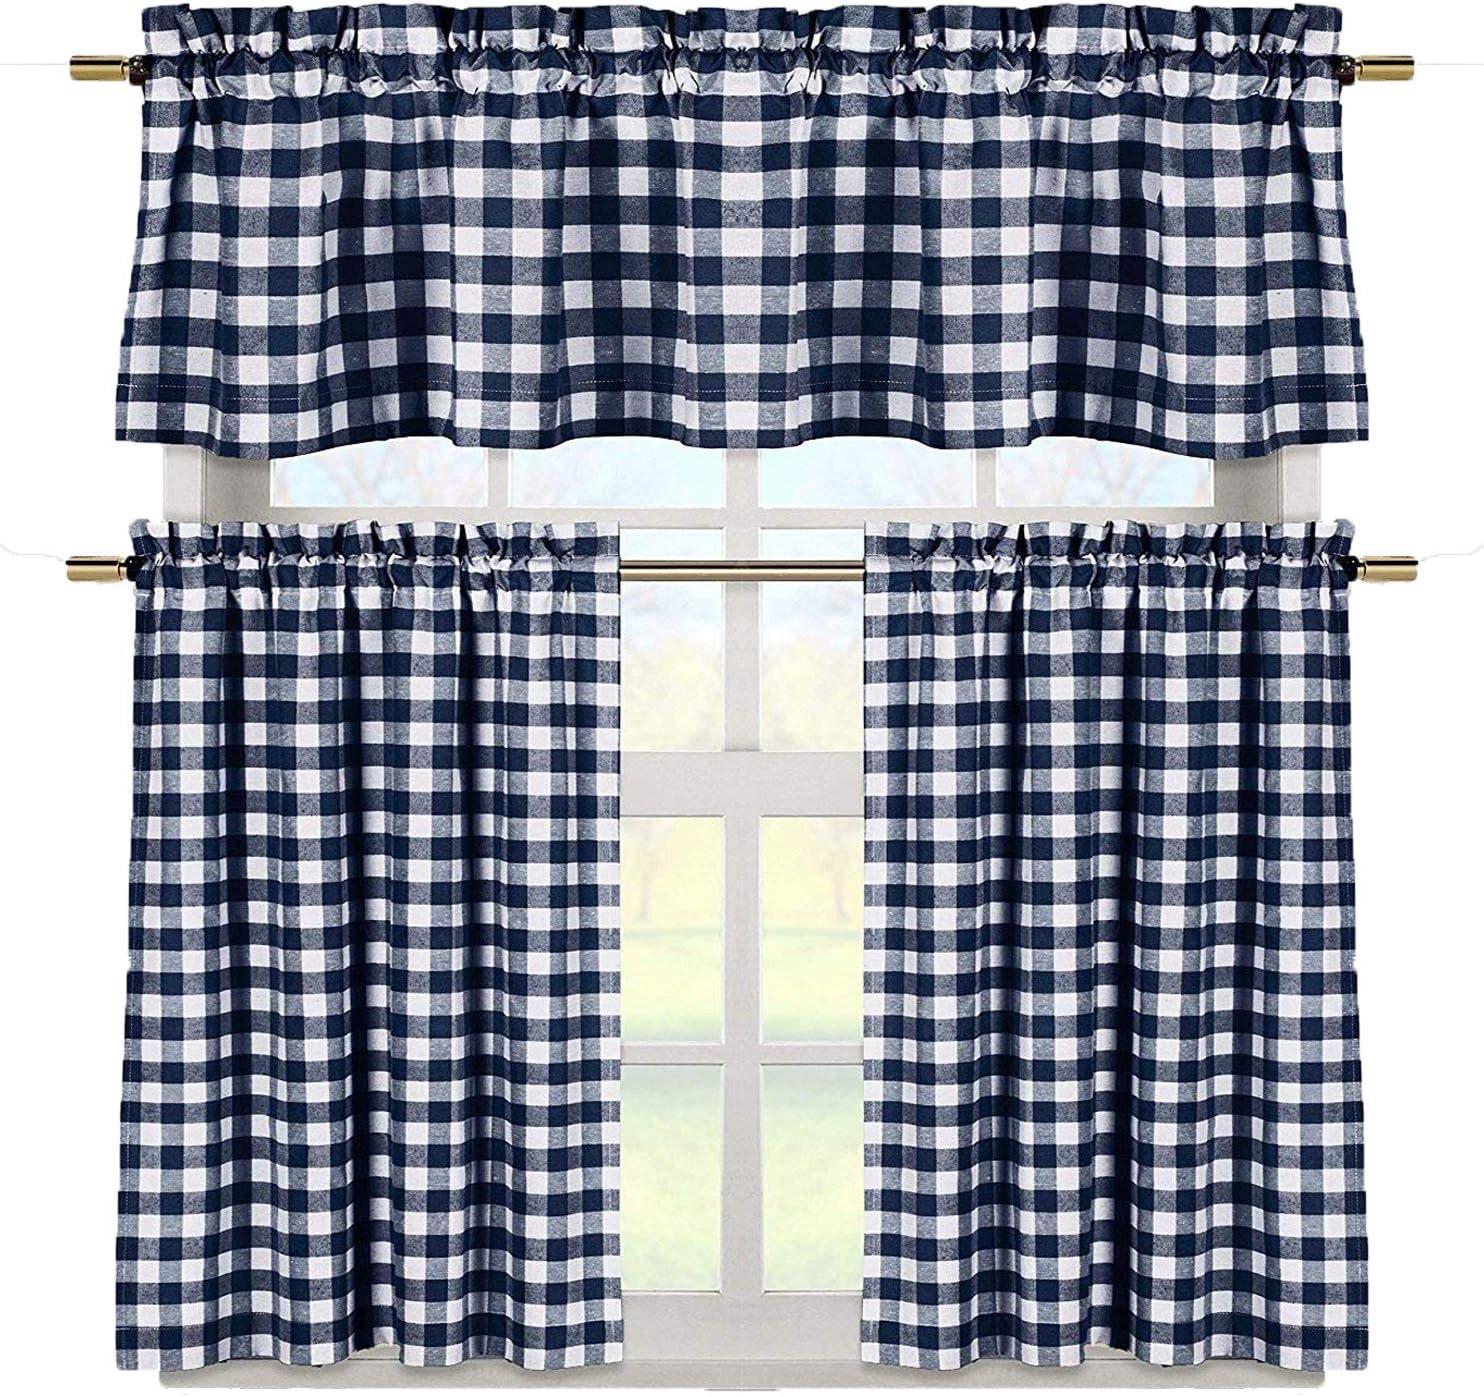 Duck River Textile Buffalo Plaid Gingham Checkered Premium Cotton Blend Kitchen Curtain Tier & Valance Set, Navy Blue & White